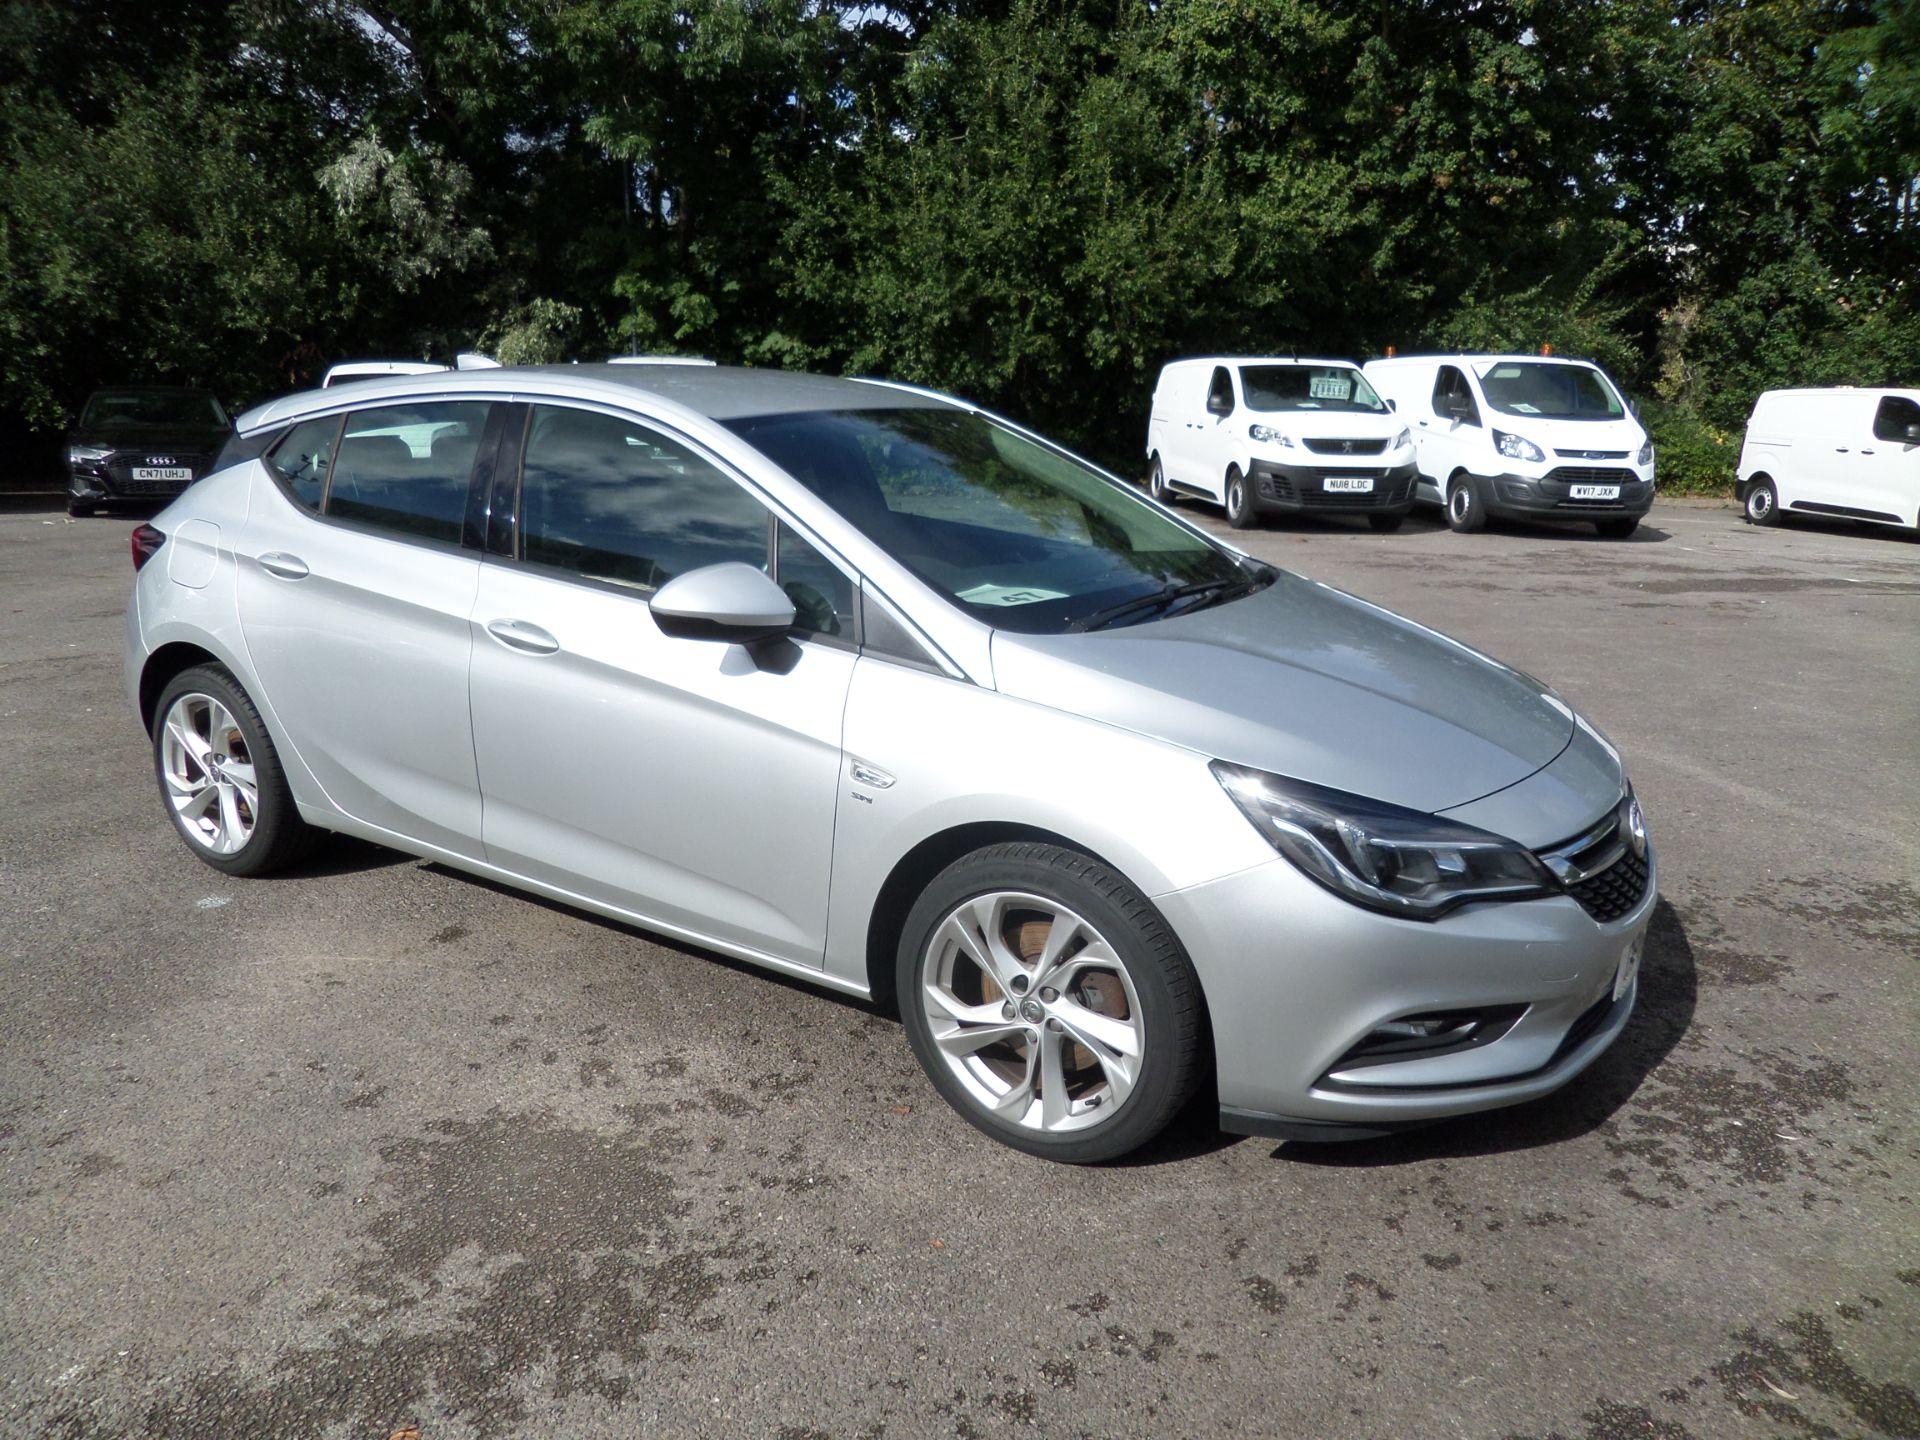 2018 Vauxhall Astra 1.6 Cdti 16V 136 Sri Nav 5Dr Euro 6 (DP18VCN)